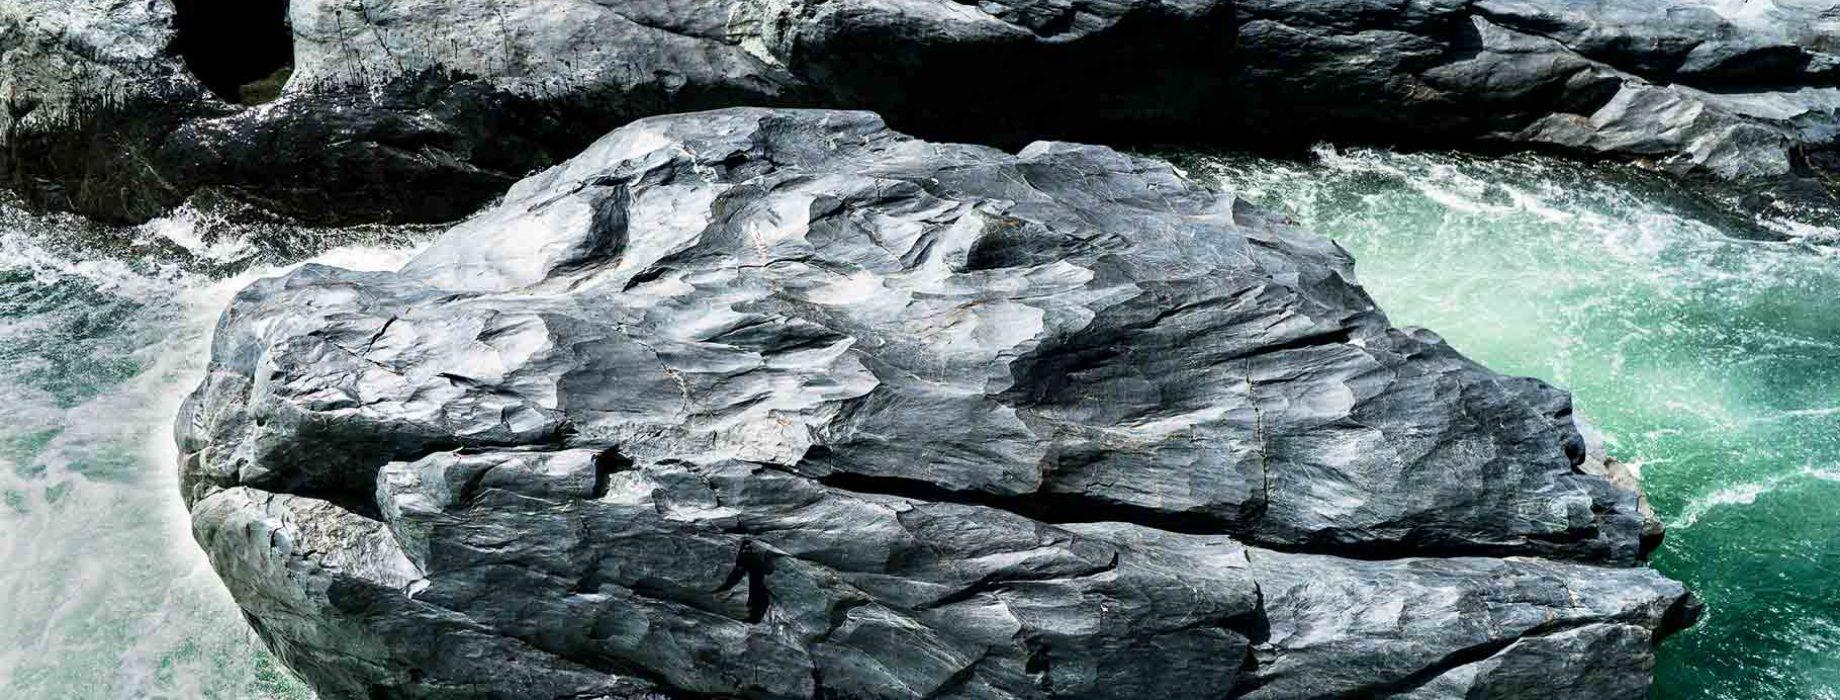 A river flows around a boulder